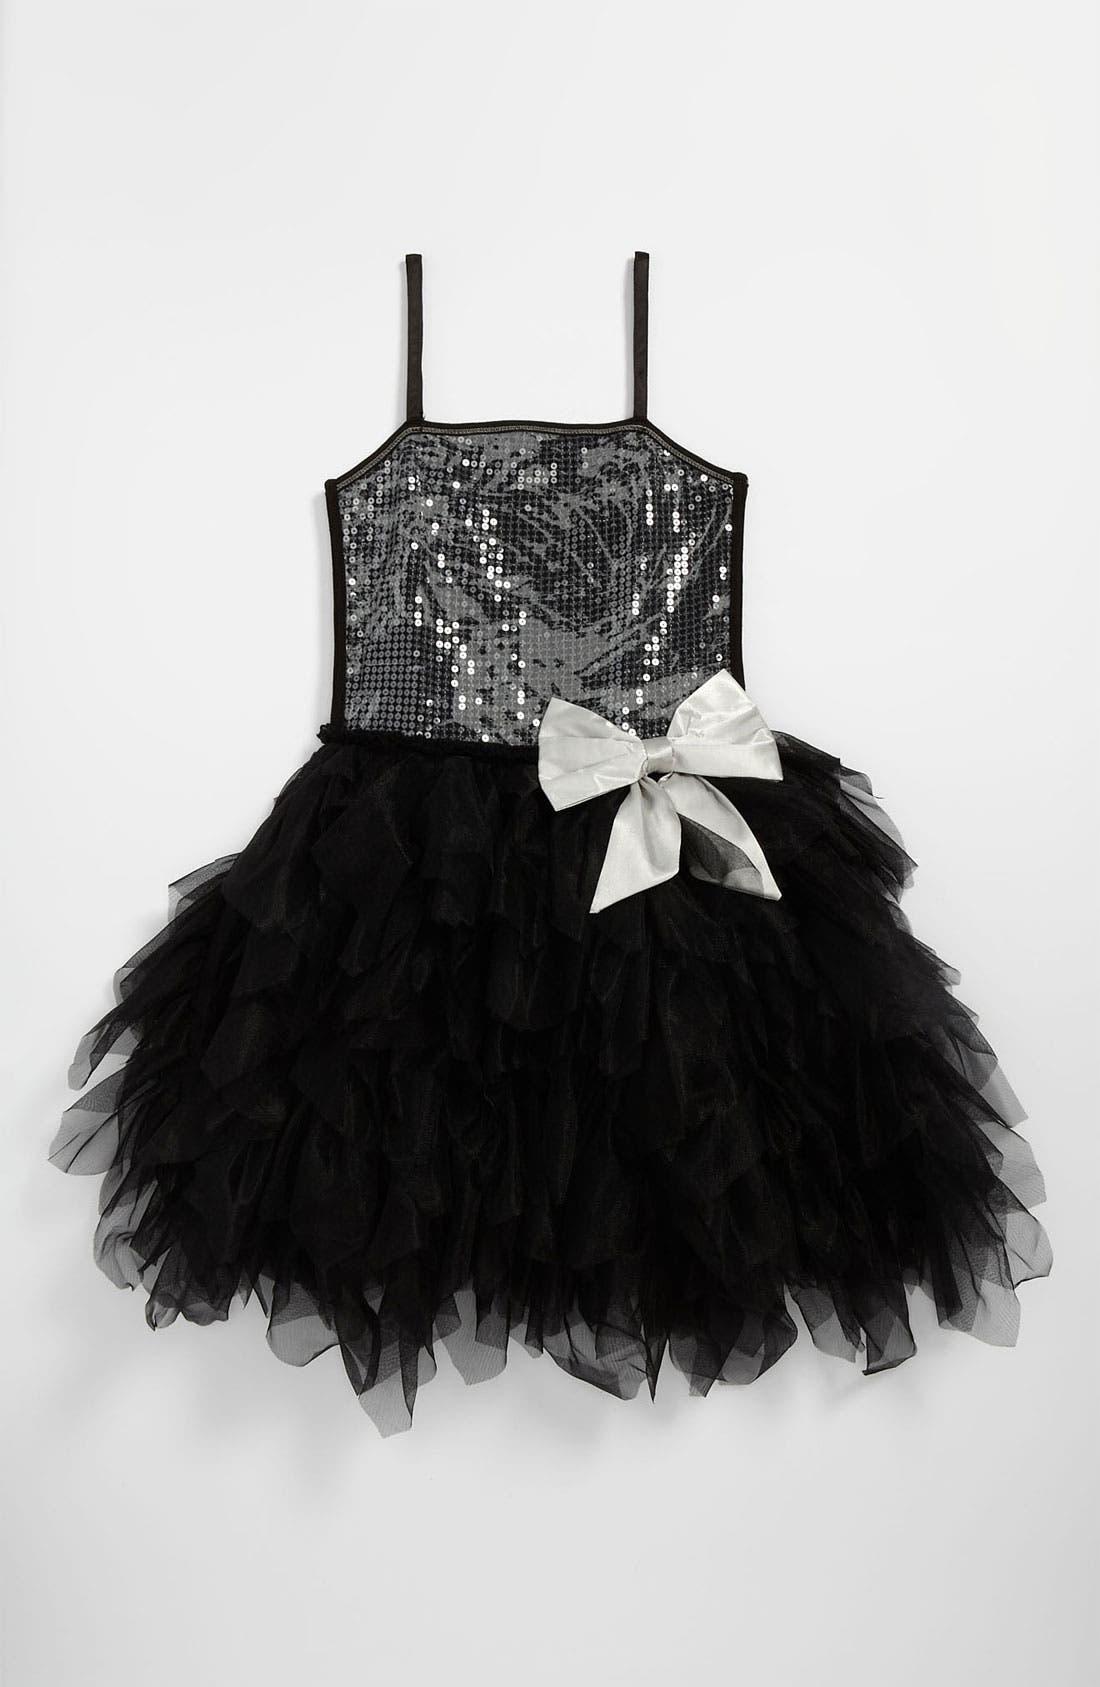 Alternate Image 1 Selected - Ooh! La, La! Couture 'Wow Emma' Dress (Big Girls)